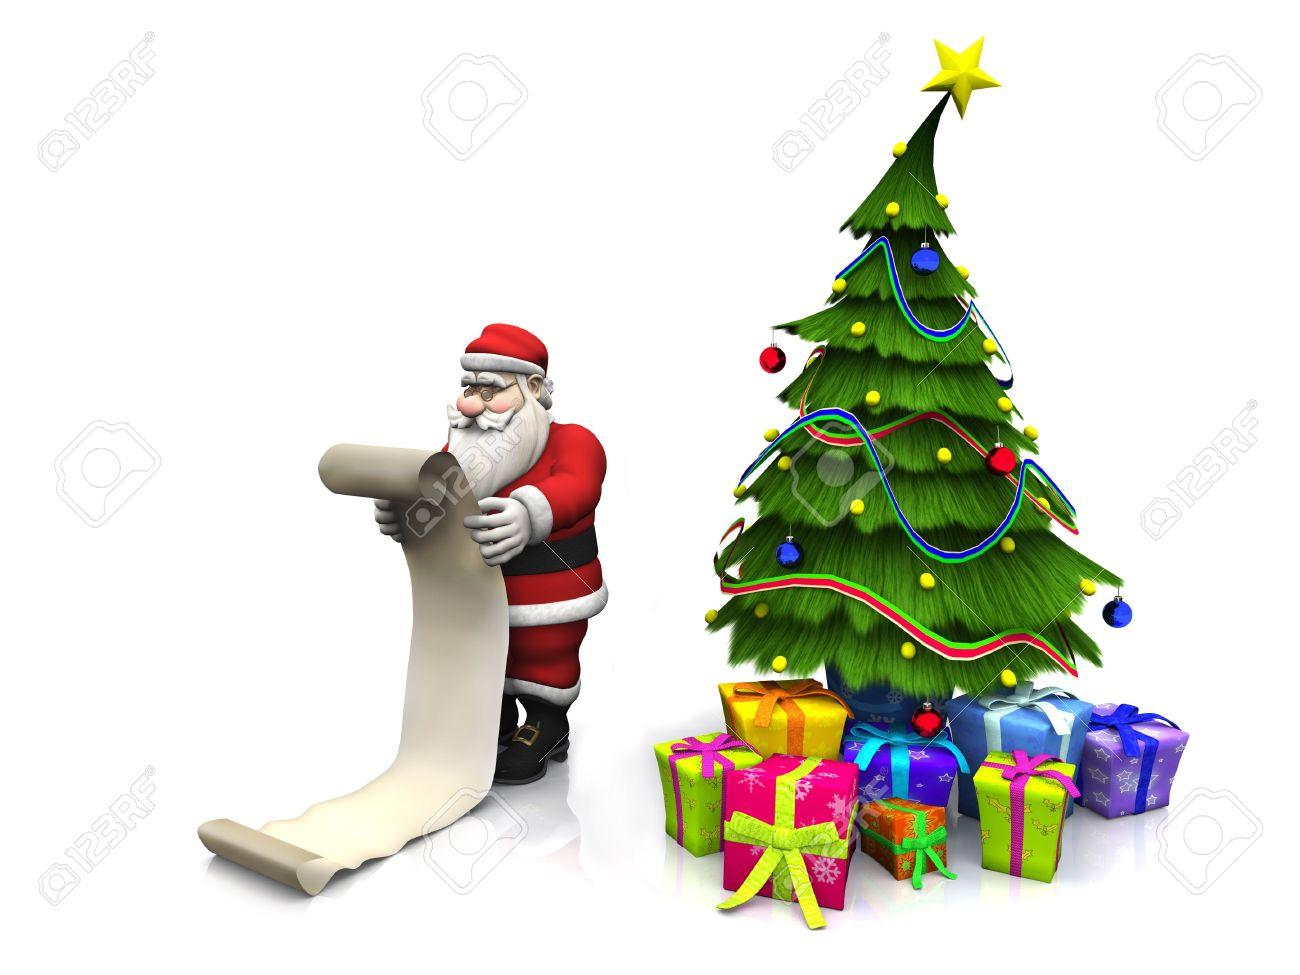 A Cartoon Santa Claus Holding A Long Wish List. Beside Him Is ...